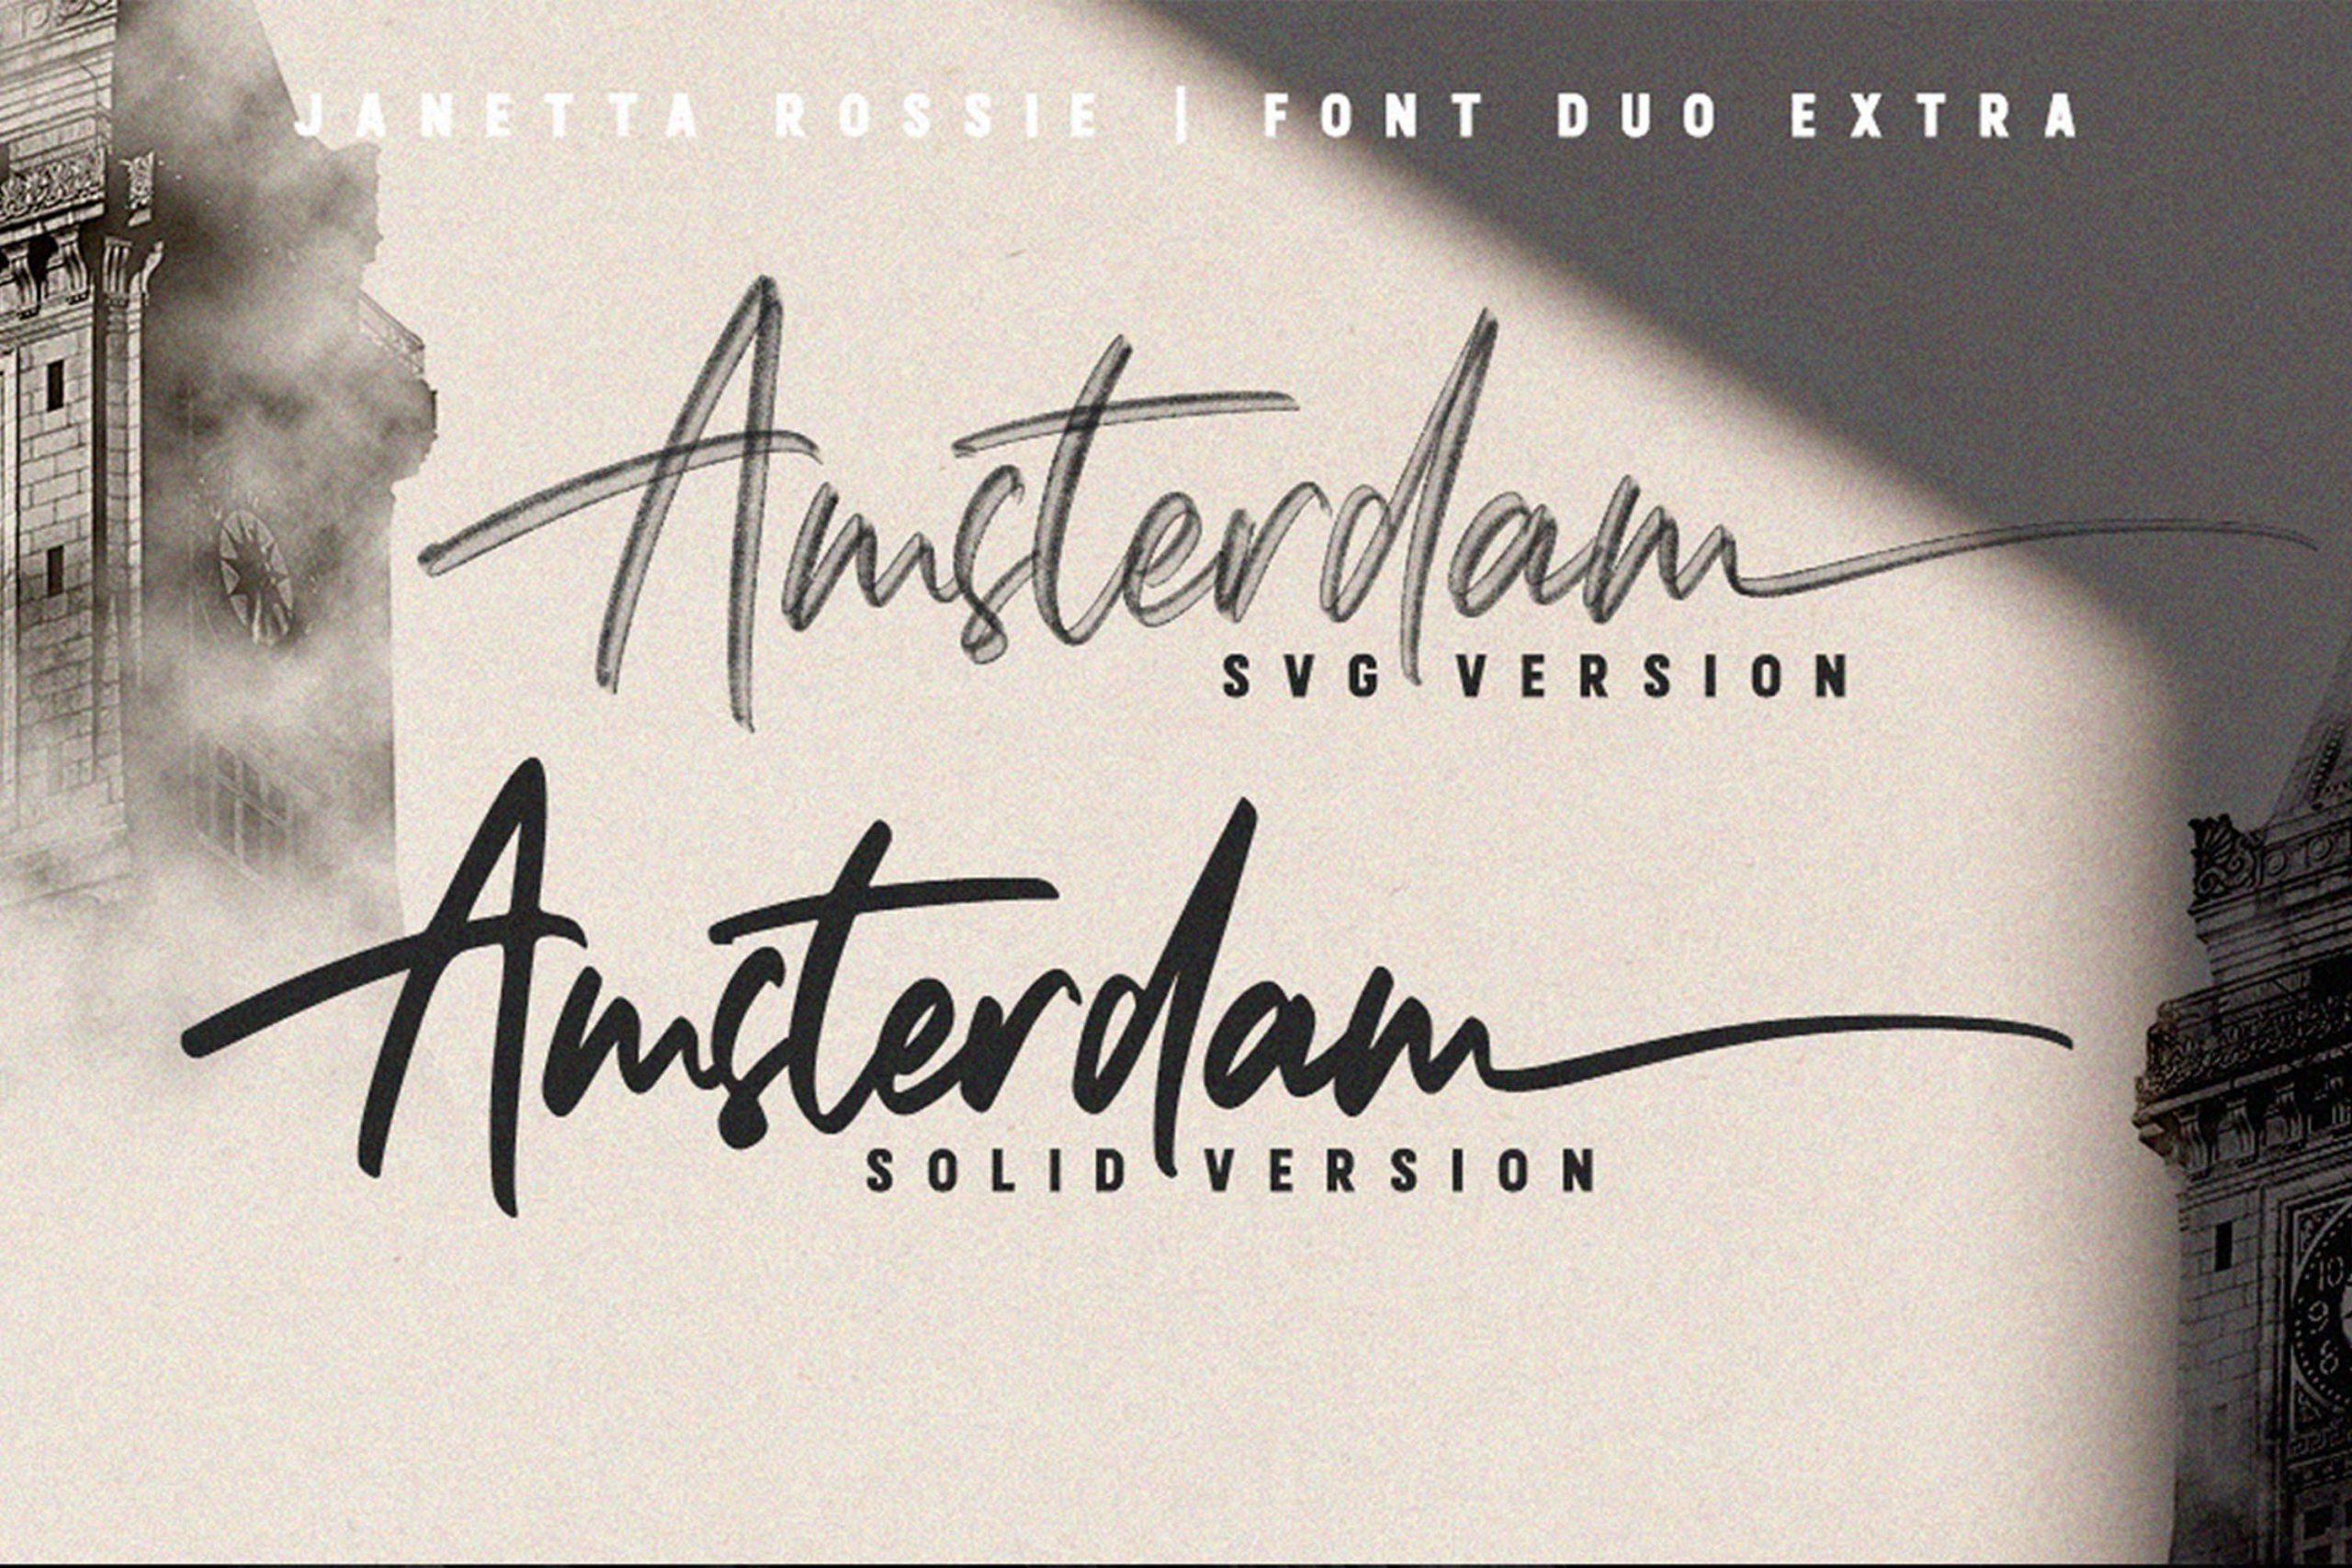 janetta-rossie-script-font-1